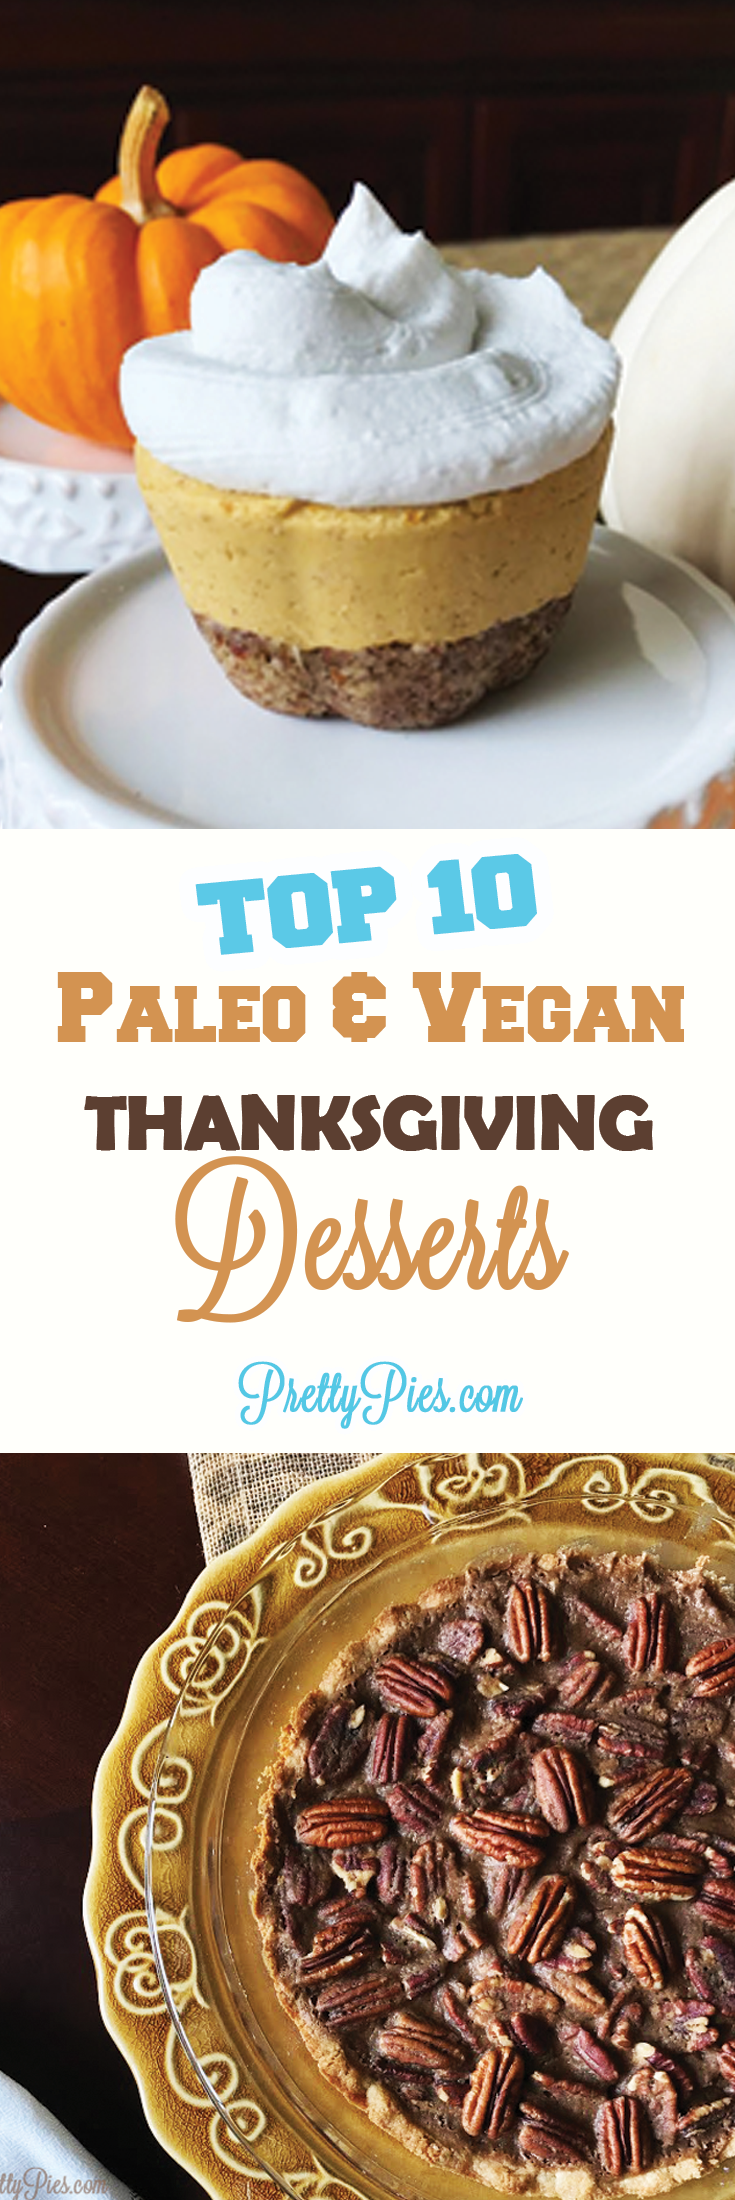 My Top 10 Paleo Vegan Thanksgiving Dessert Recipes Pretty Pies Vegan Thanksgiving Dessert Thanksgiving Food Desserts Thanksgiving Desserts